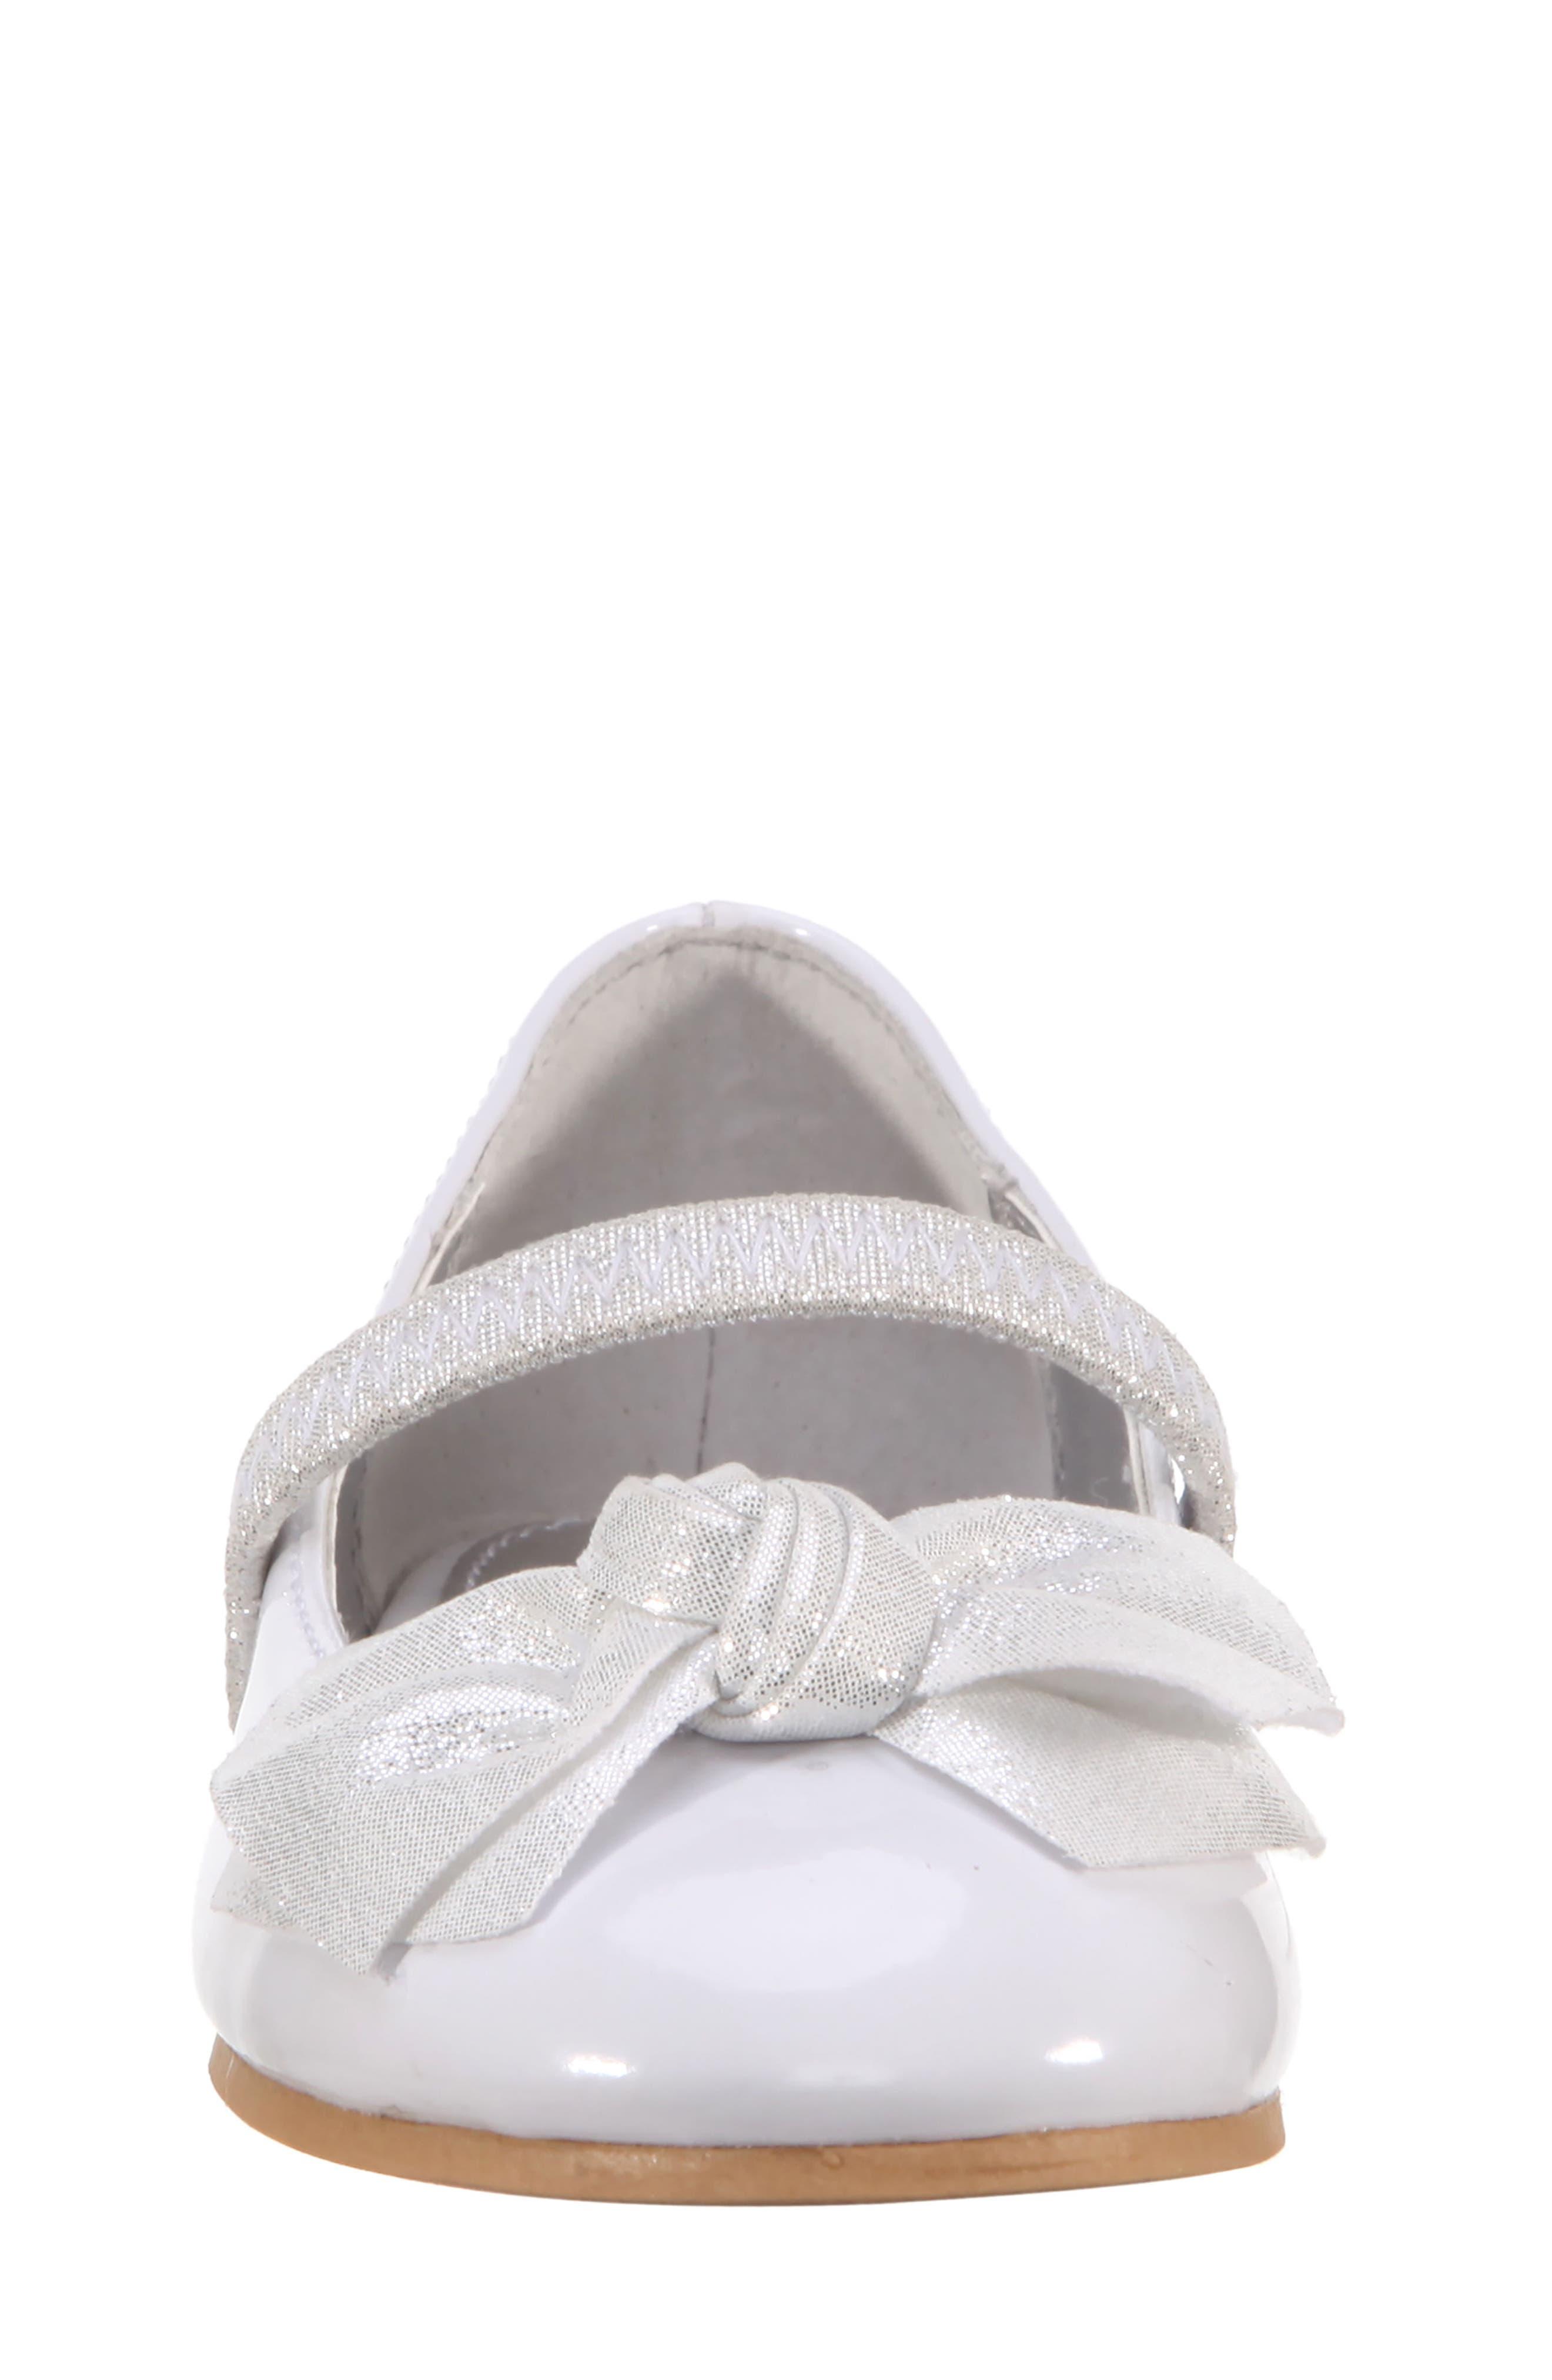 Kaytelyn-T Glitter Bow Ballet Flat,                             Alternate thumbnail 23, color,